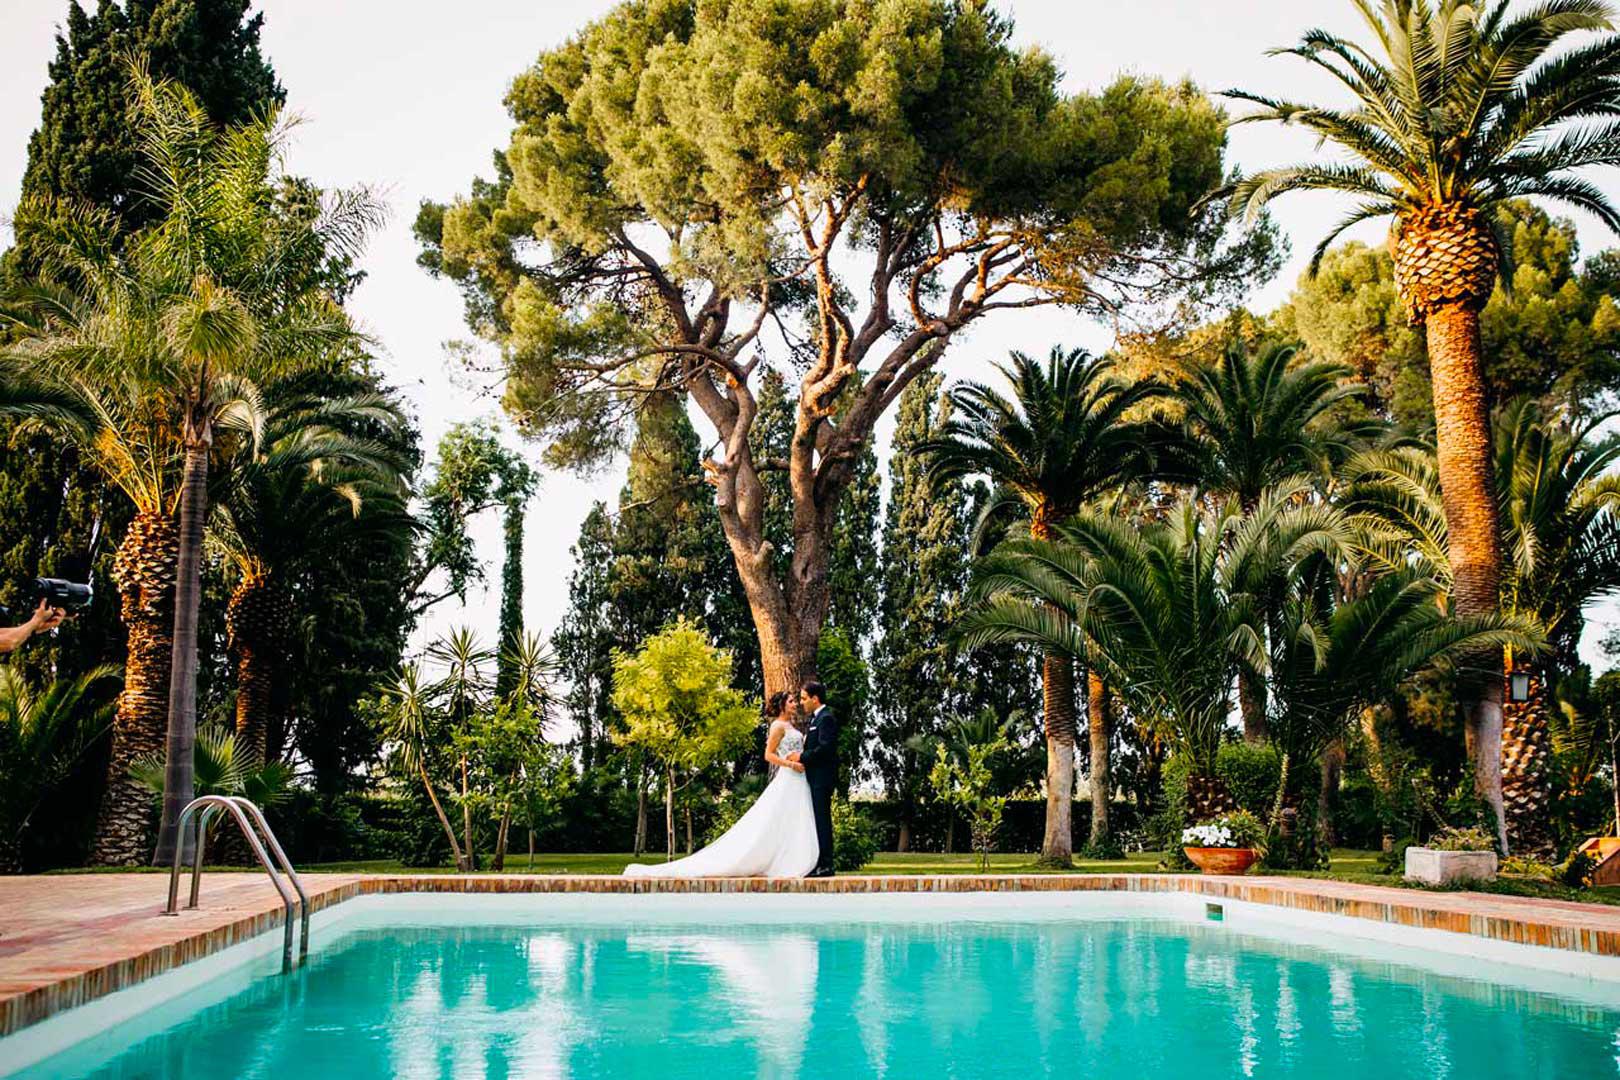 037-torre-giulia-wedding-gianni-lepore